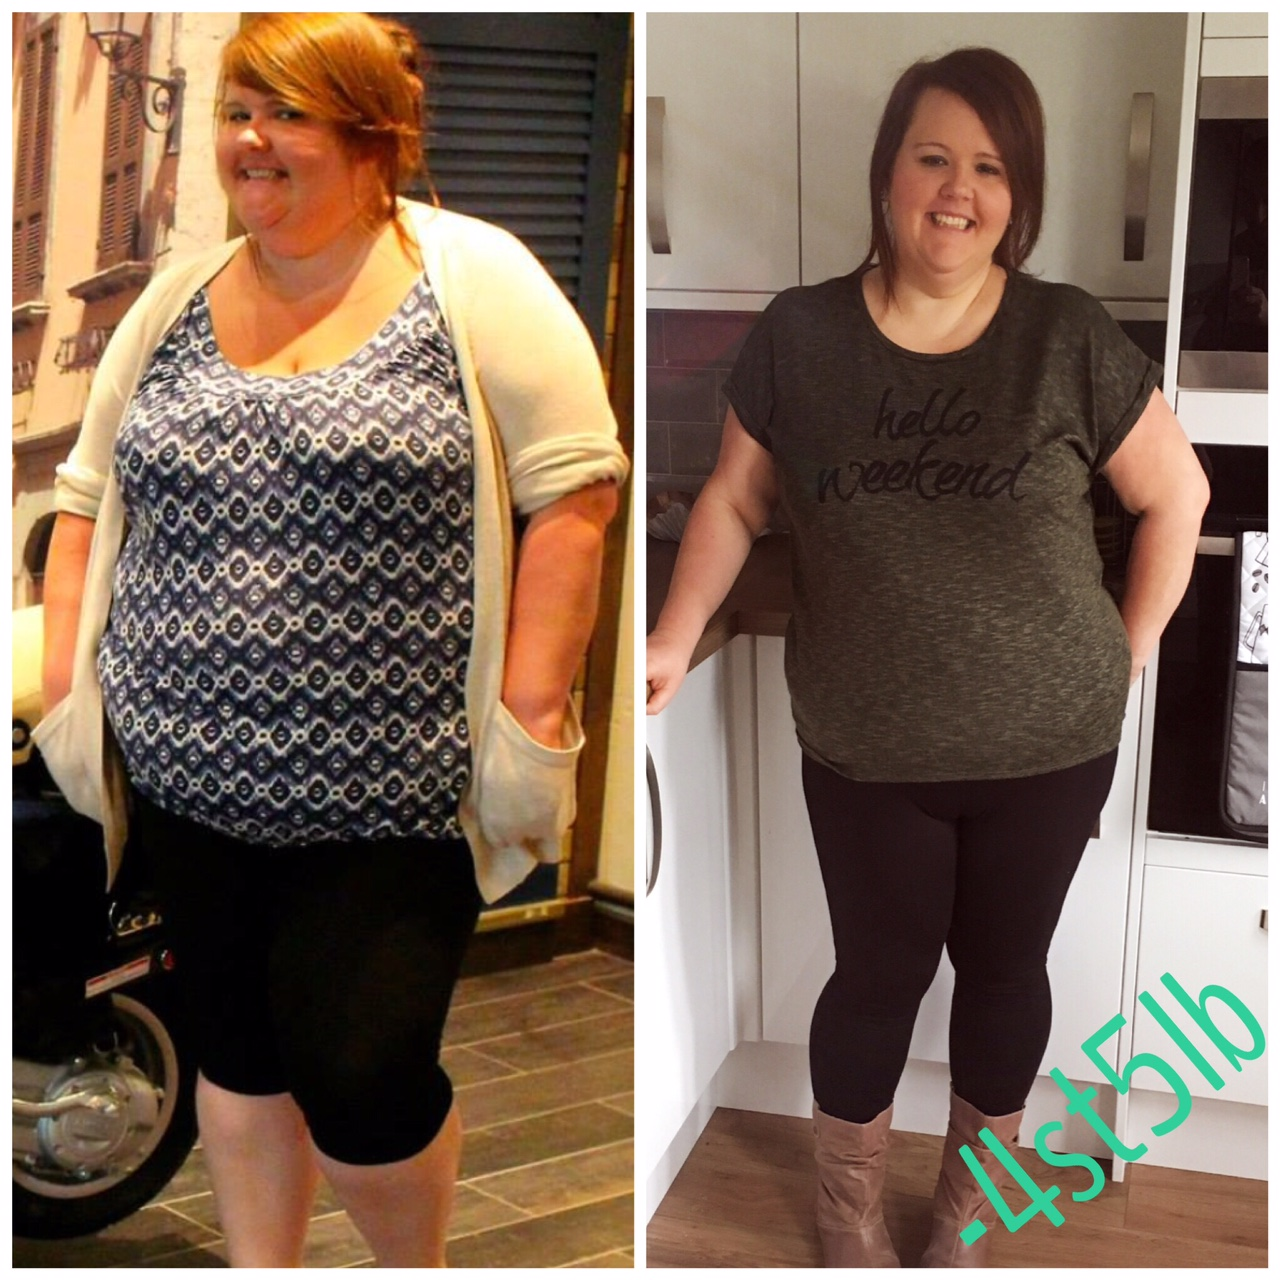 weight loss progress fatgirlskinny net slimming world weight